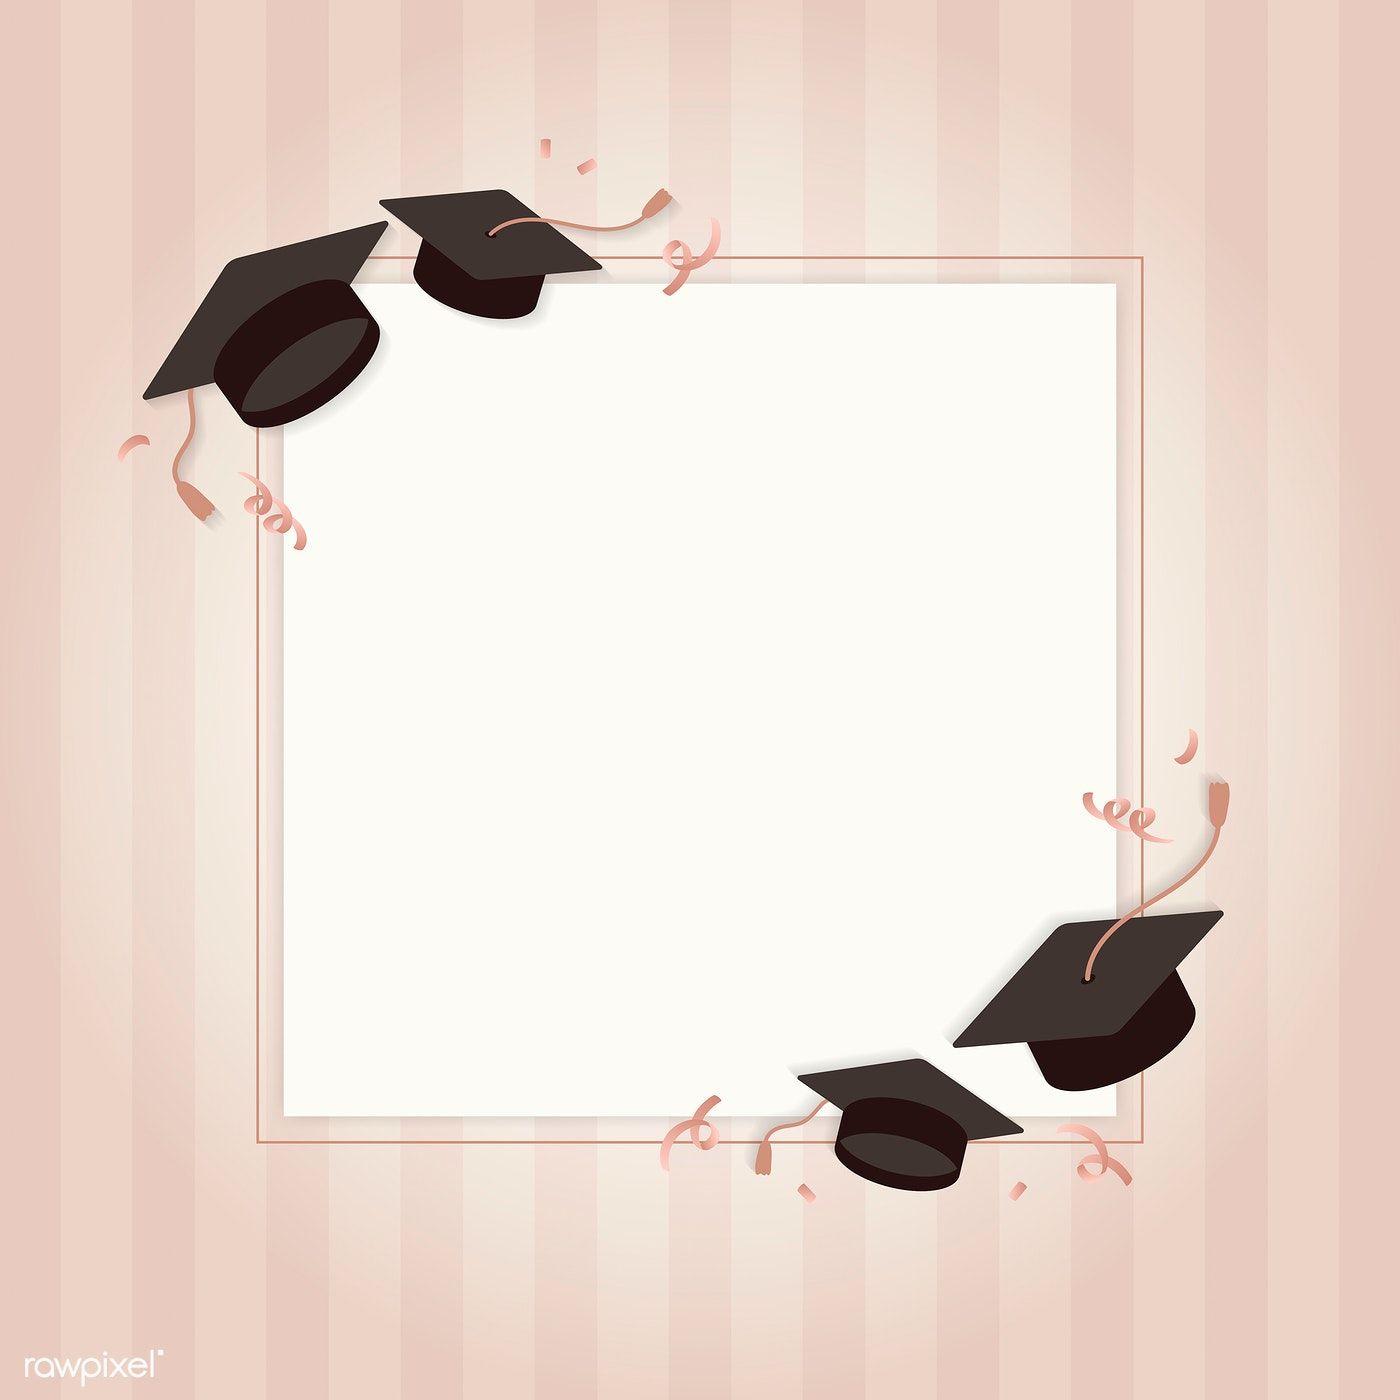 Graduation Background With Mortar Boards Vector Free Image By Rawpixel Com Ningzk V Graduation Wallpaper Graduation Frame Vector Free